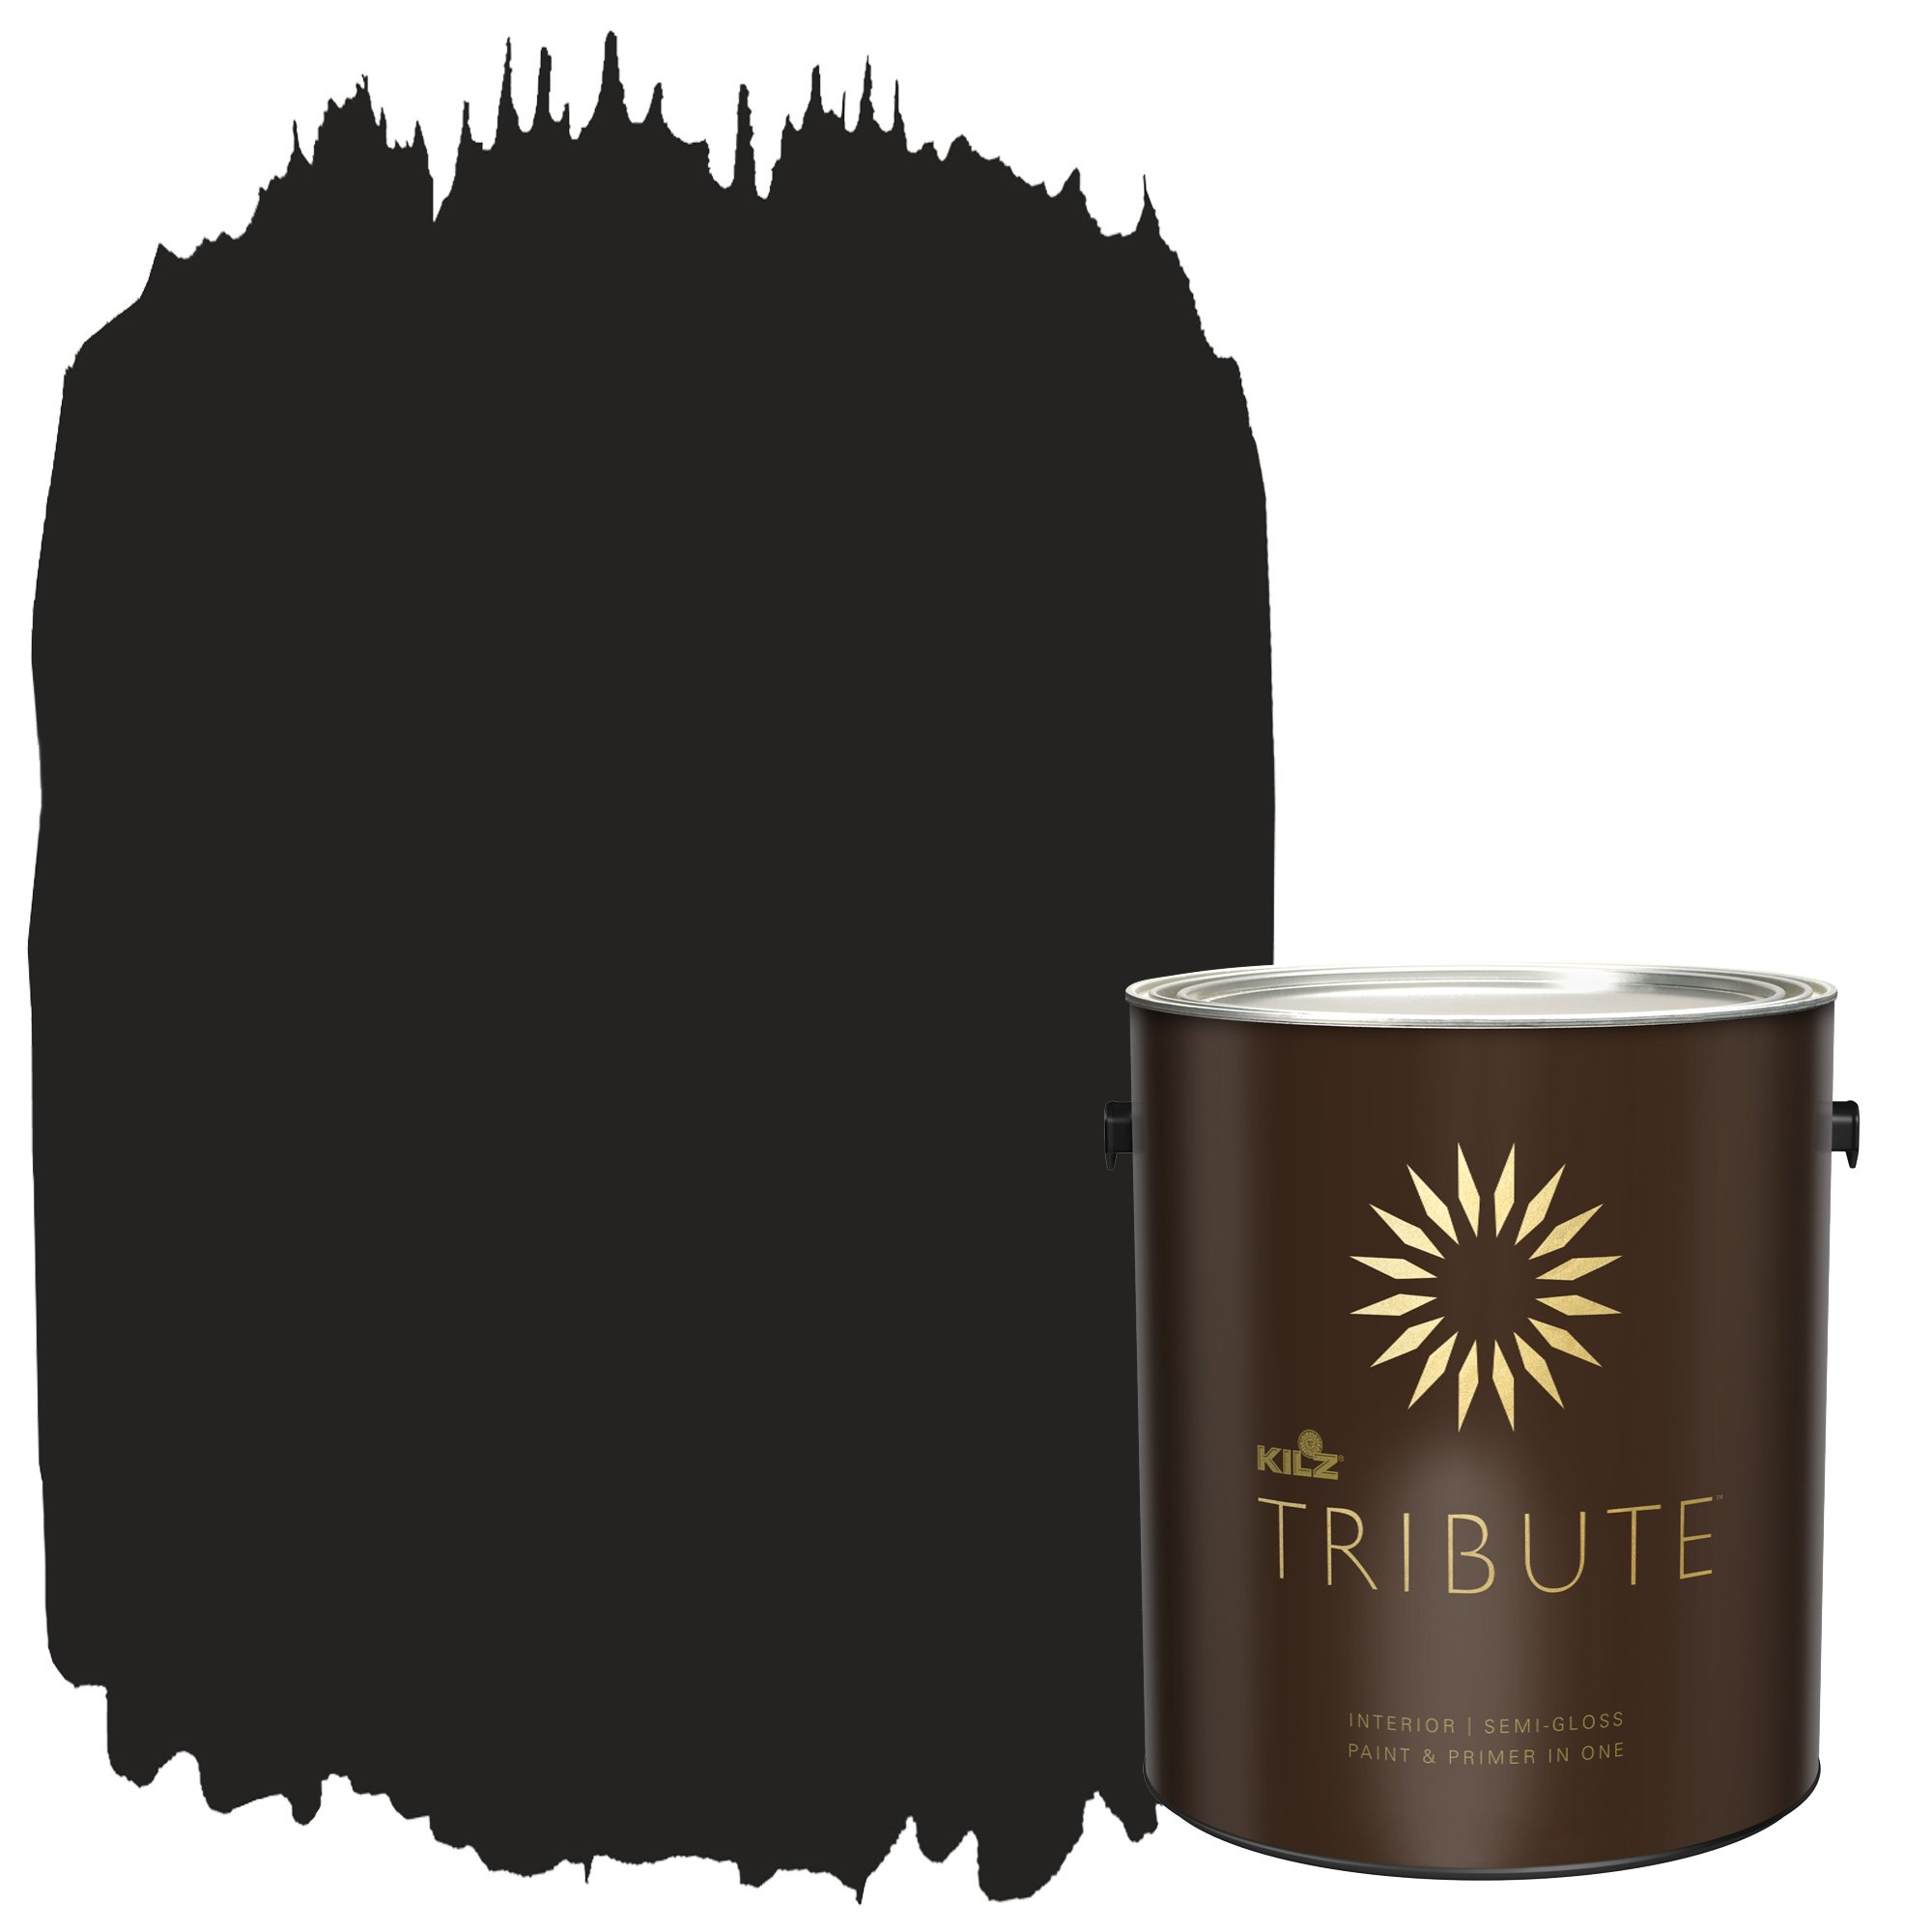 KILZ TRIBUTE Interior Semi-Gloss Paint and Primer in One, 1 Gallon, Deep Onyx (TB-40)